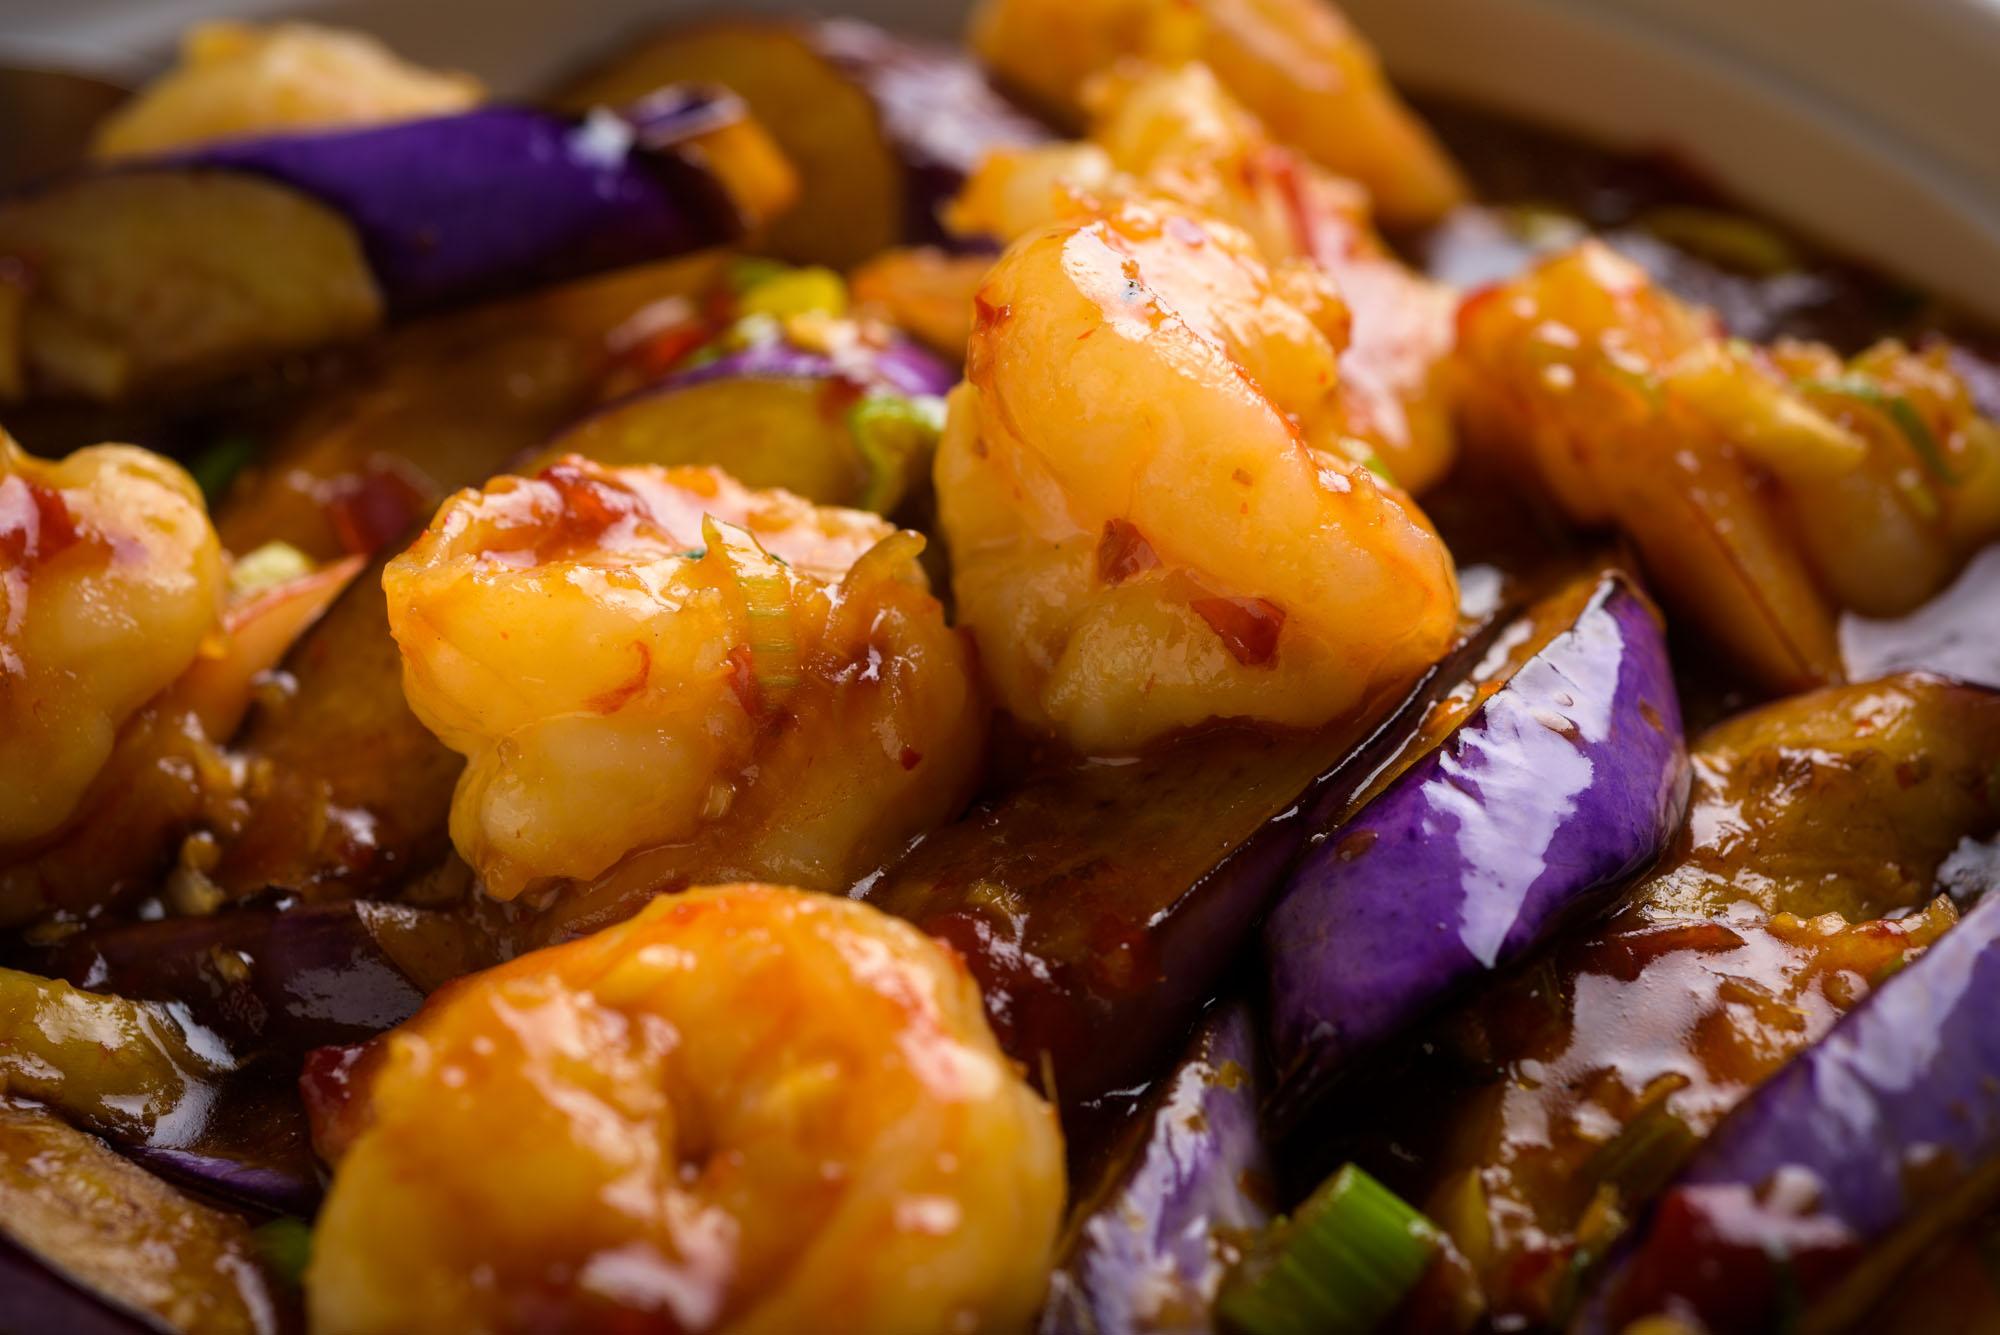 4092_d810a_Omei_Restaurant_Santa_Cruz_Food_Photography.jpg